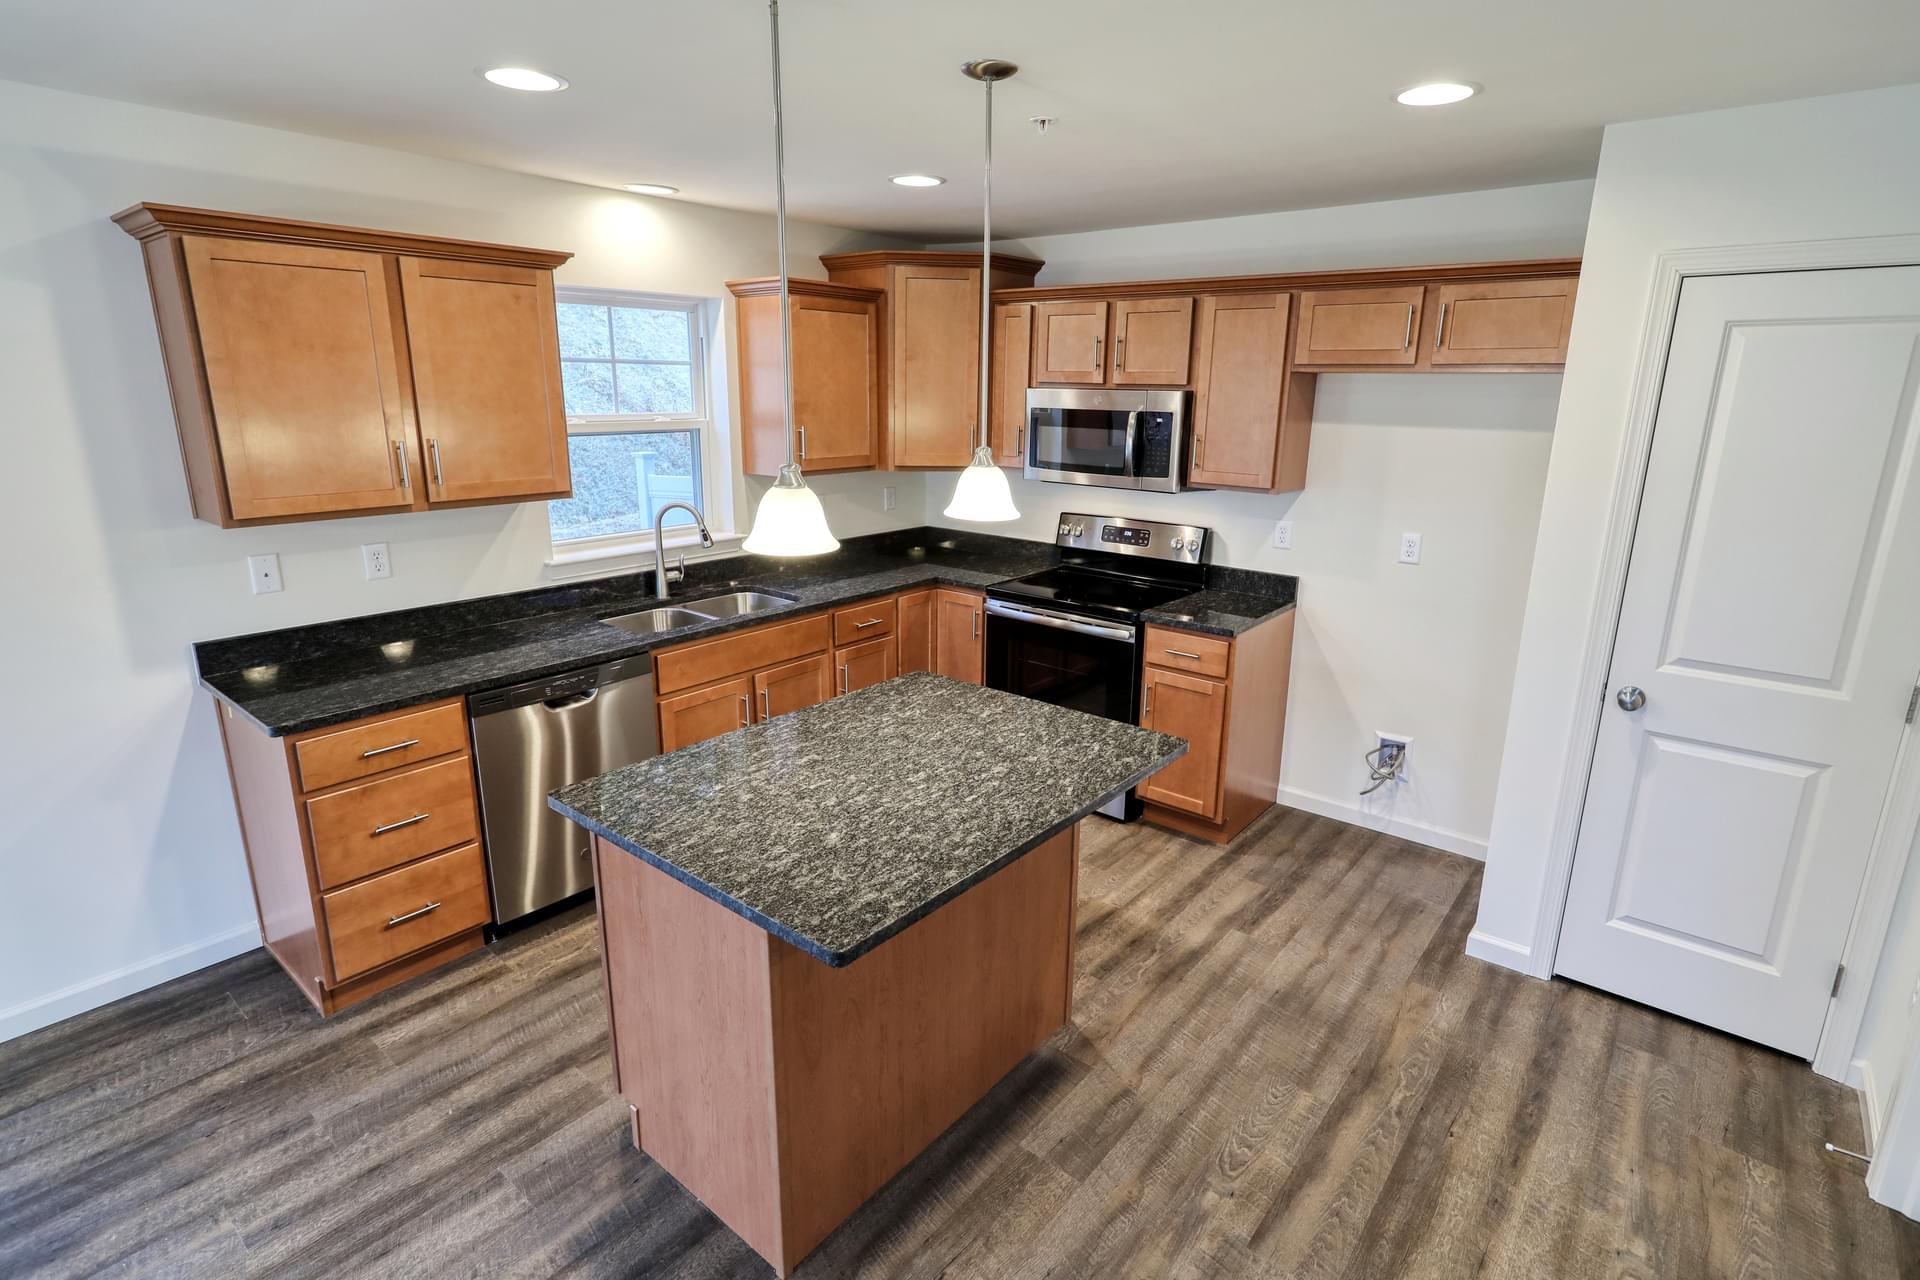 3br New Home in Stewartstown, PA